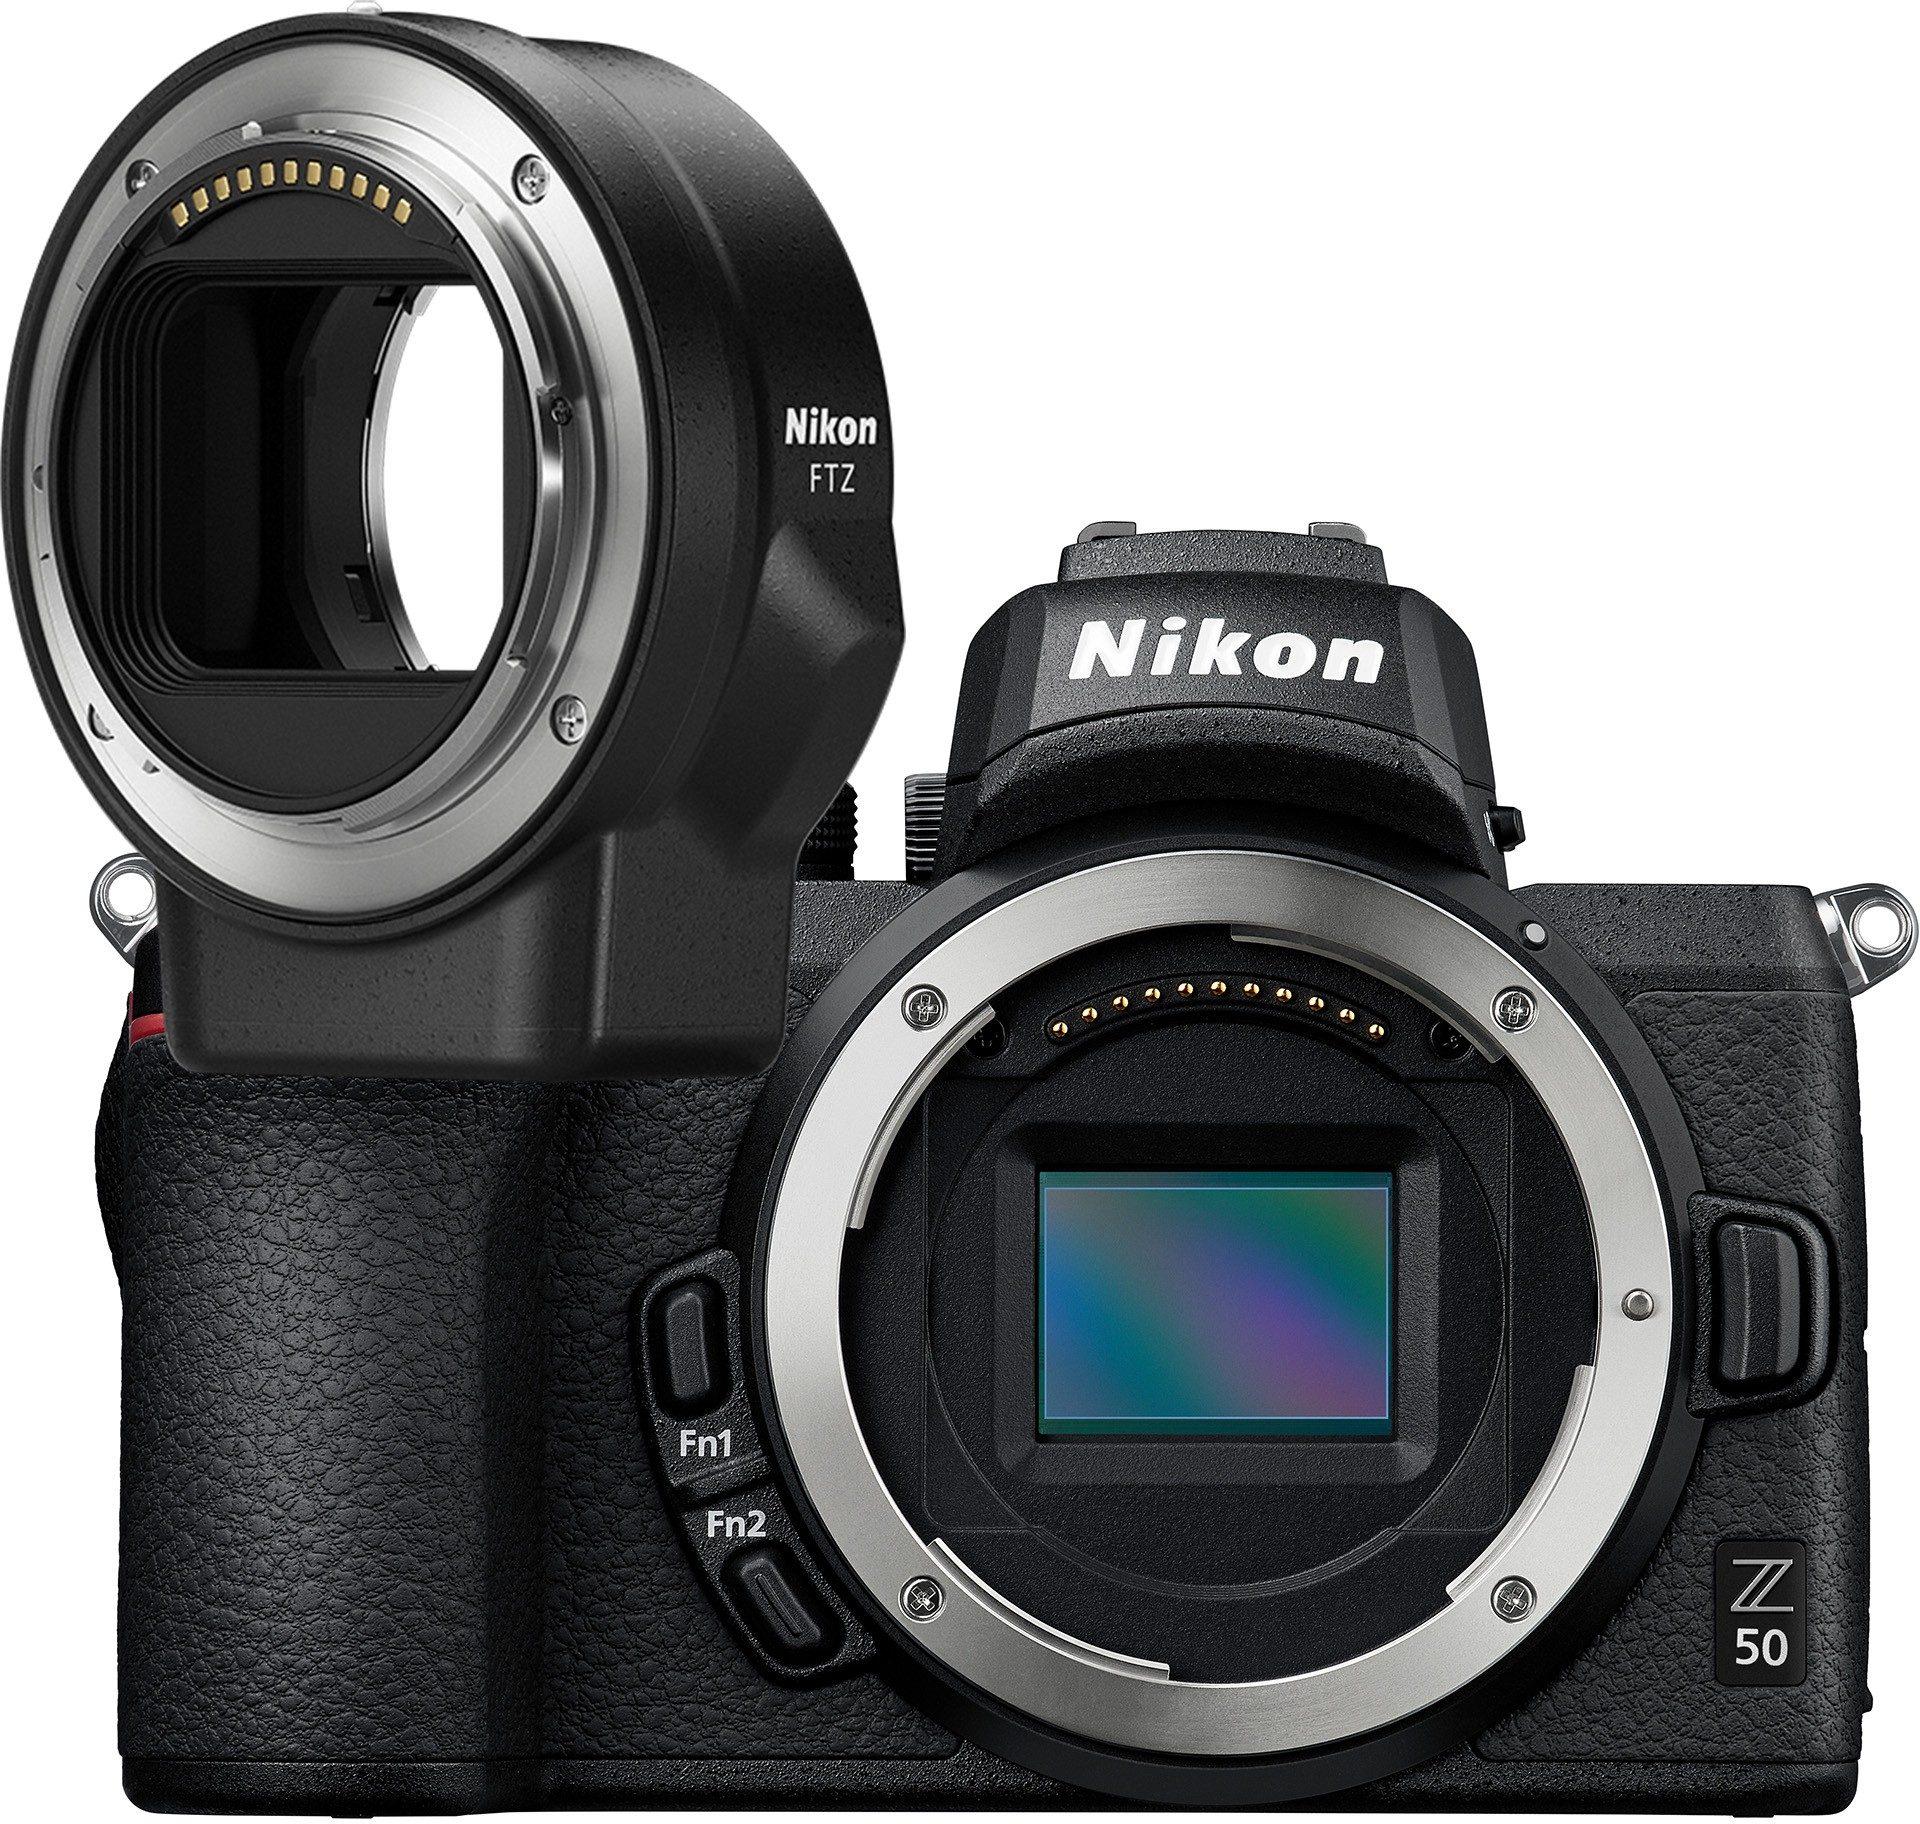 Nikon Z50 Digital Camera Body + FTZ Adapter